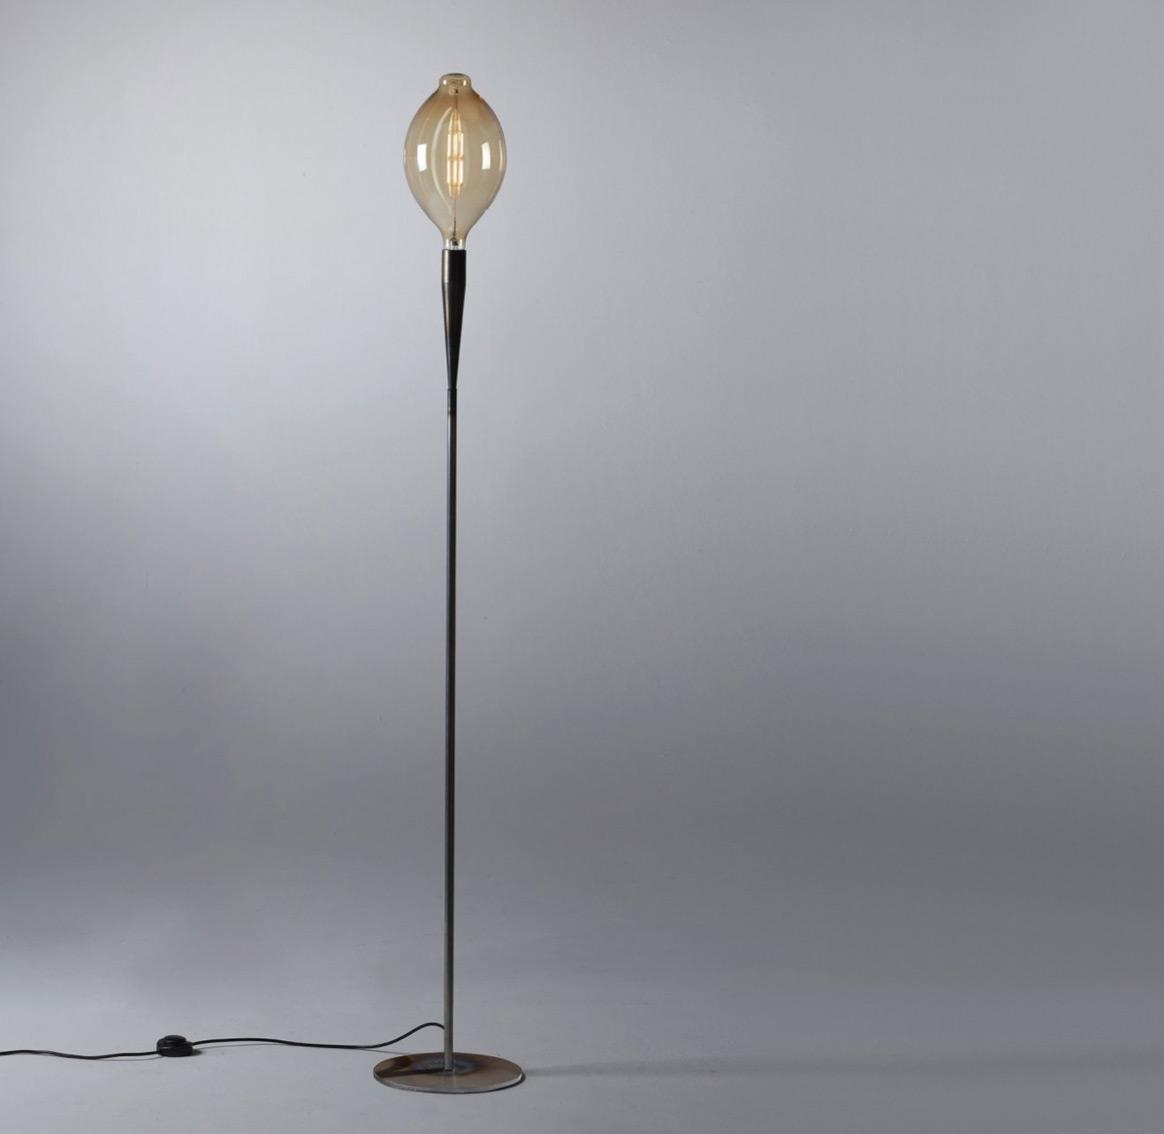 Unidea 3512 Filament Floor Light By Egoluce